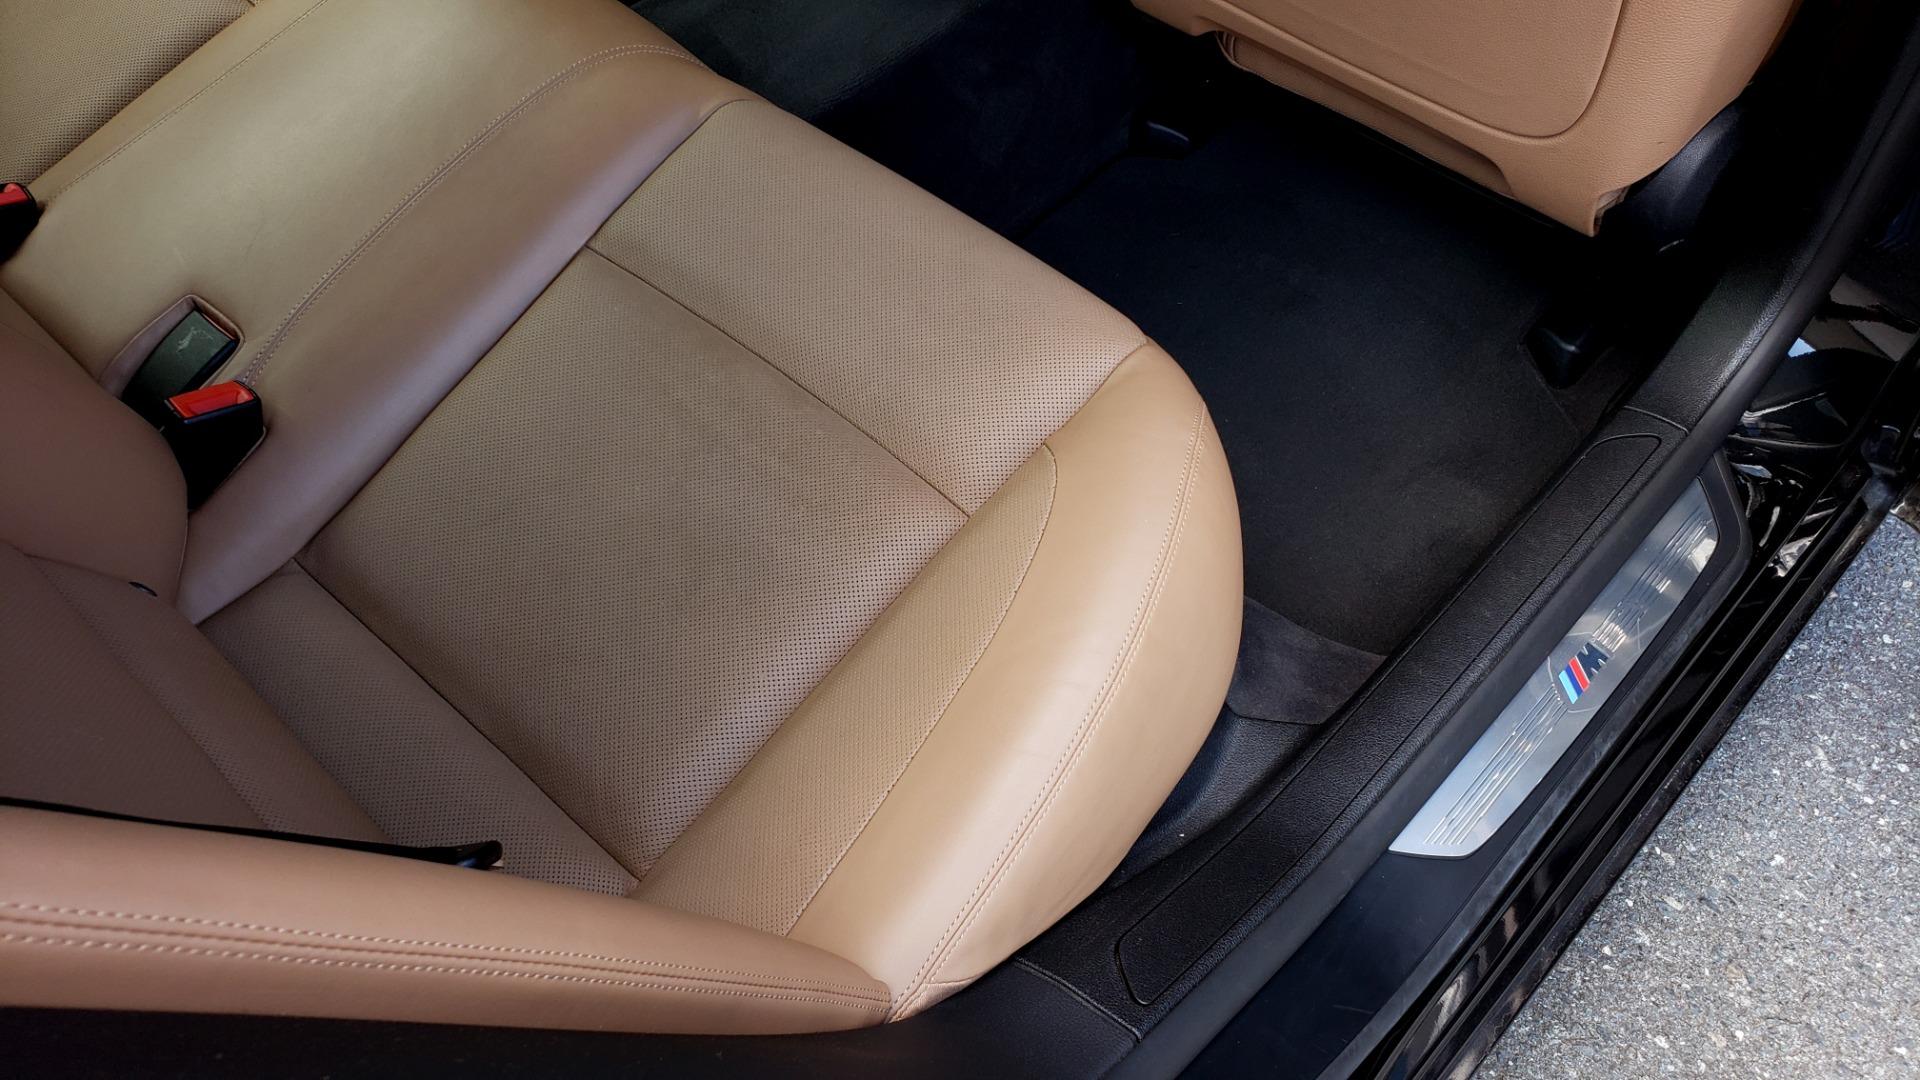 Used 2014 BMW 7 SERIES 750LI M-SPORT / EXEC PKG / DRVR ASST / LIGHTING / NAV / SUNROOF for sale Sold at Formula Imports in Charlotte NC 28227 70